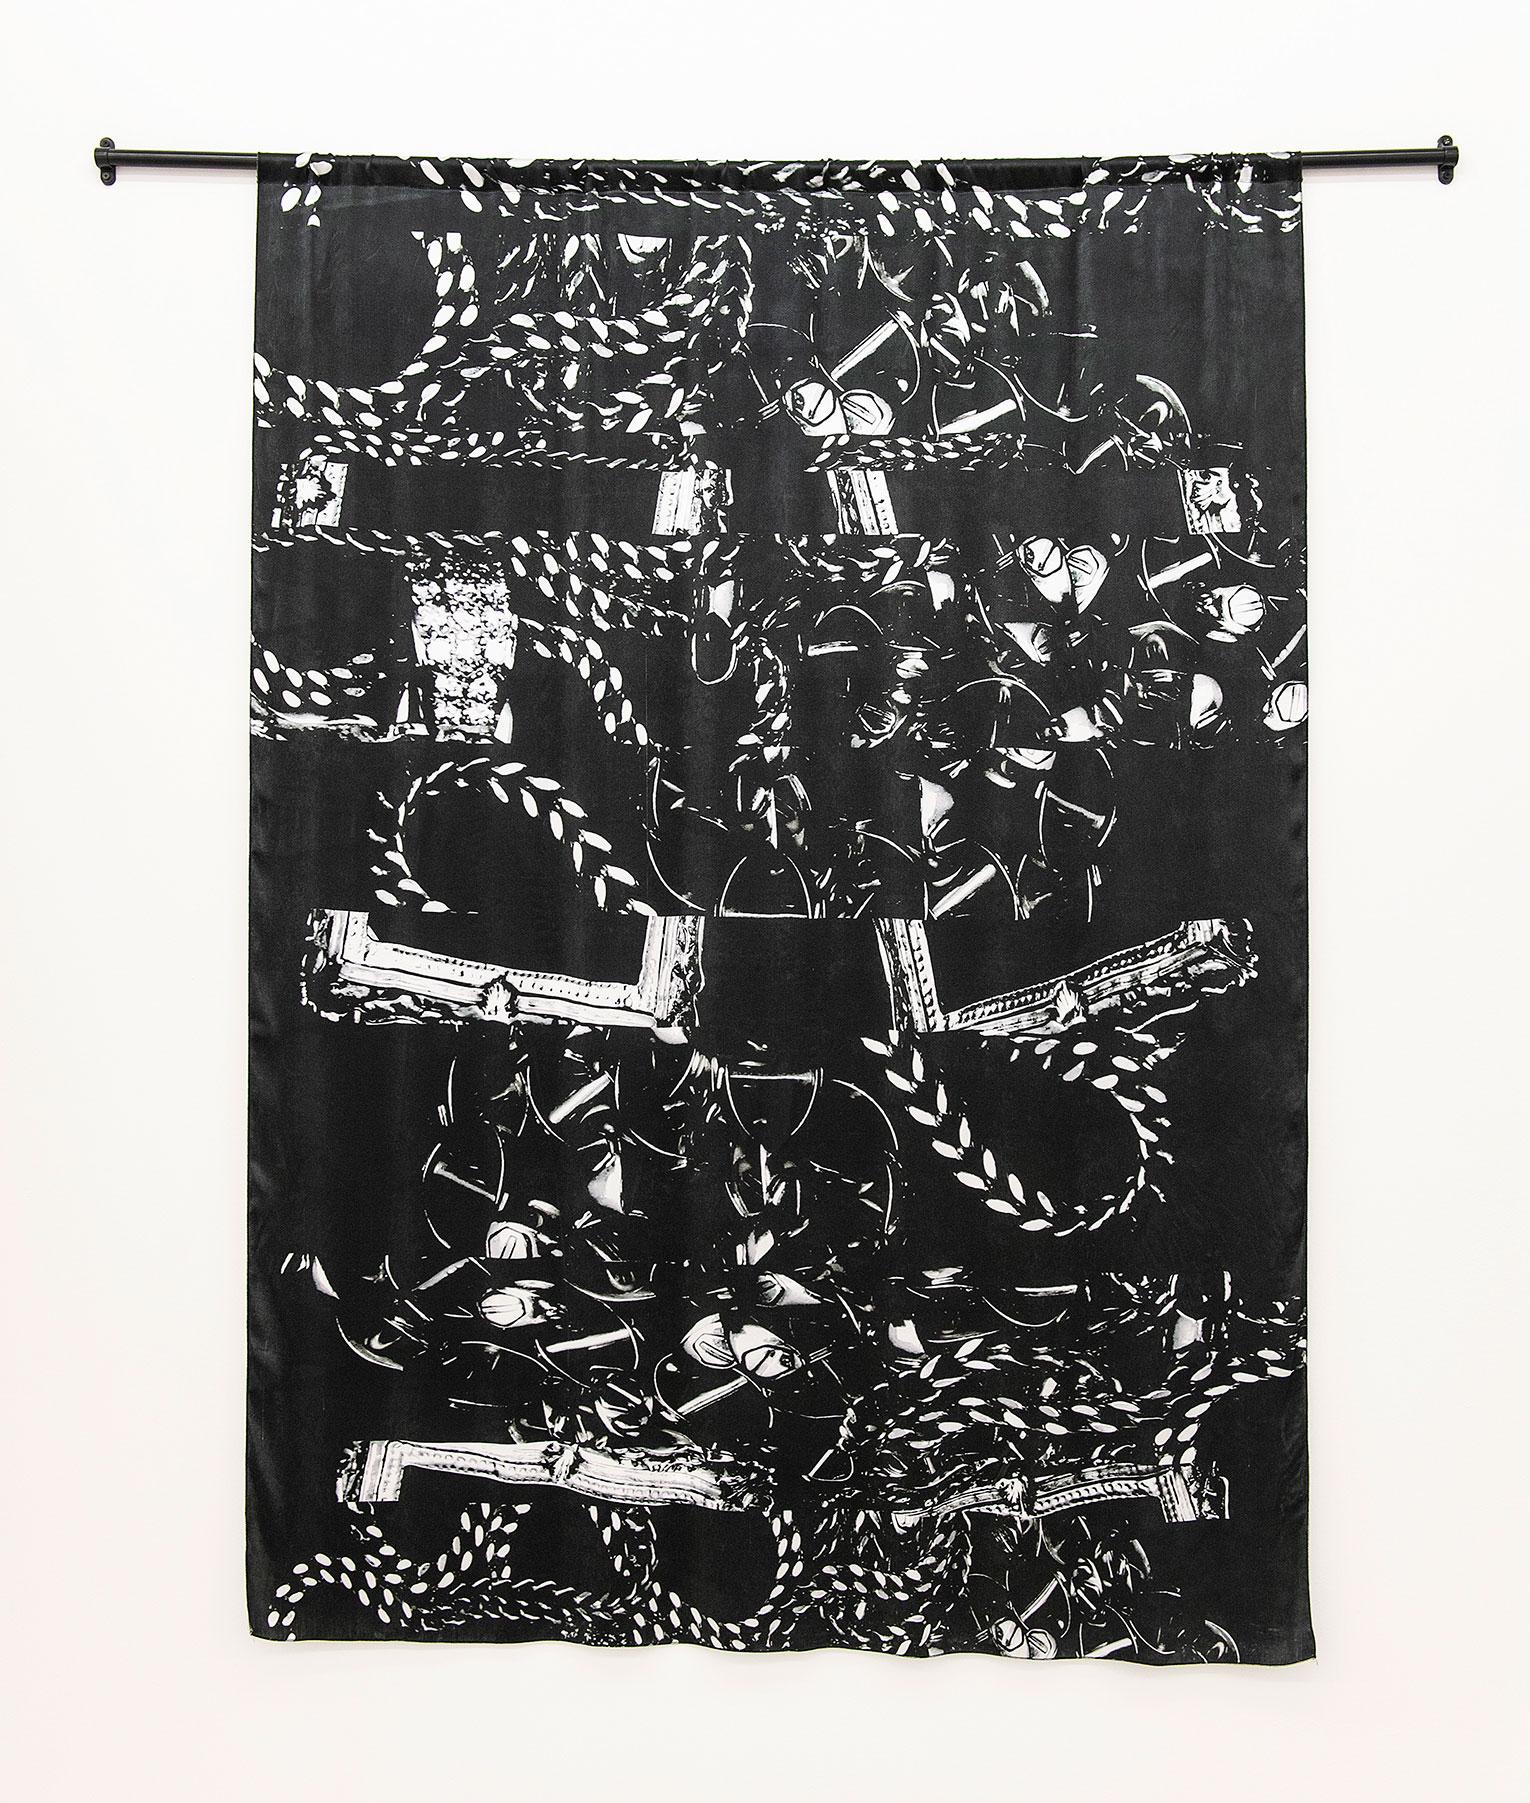 <b>Title:&nbsp;</b>Dubois X Fanon<br /><b>Year:&nbsp;</b>2018<br /><b>Medium:&nbsp;</b>Digital print on Silk Chiffon<br /><b>Size:&nbsp;</b>170 x 125 cm